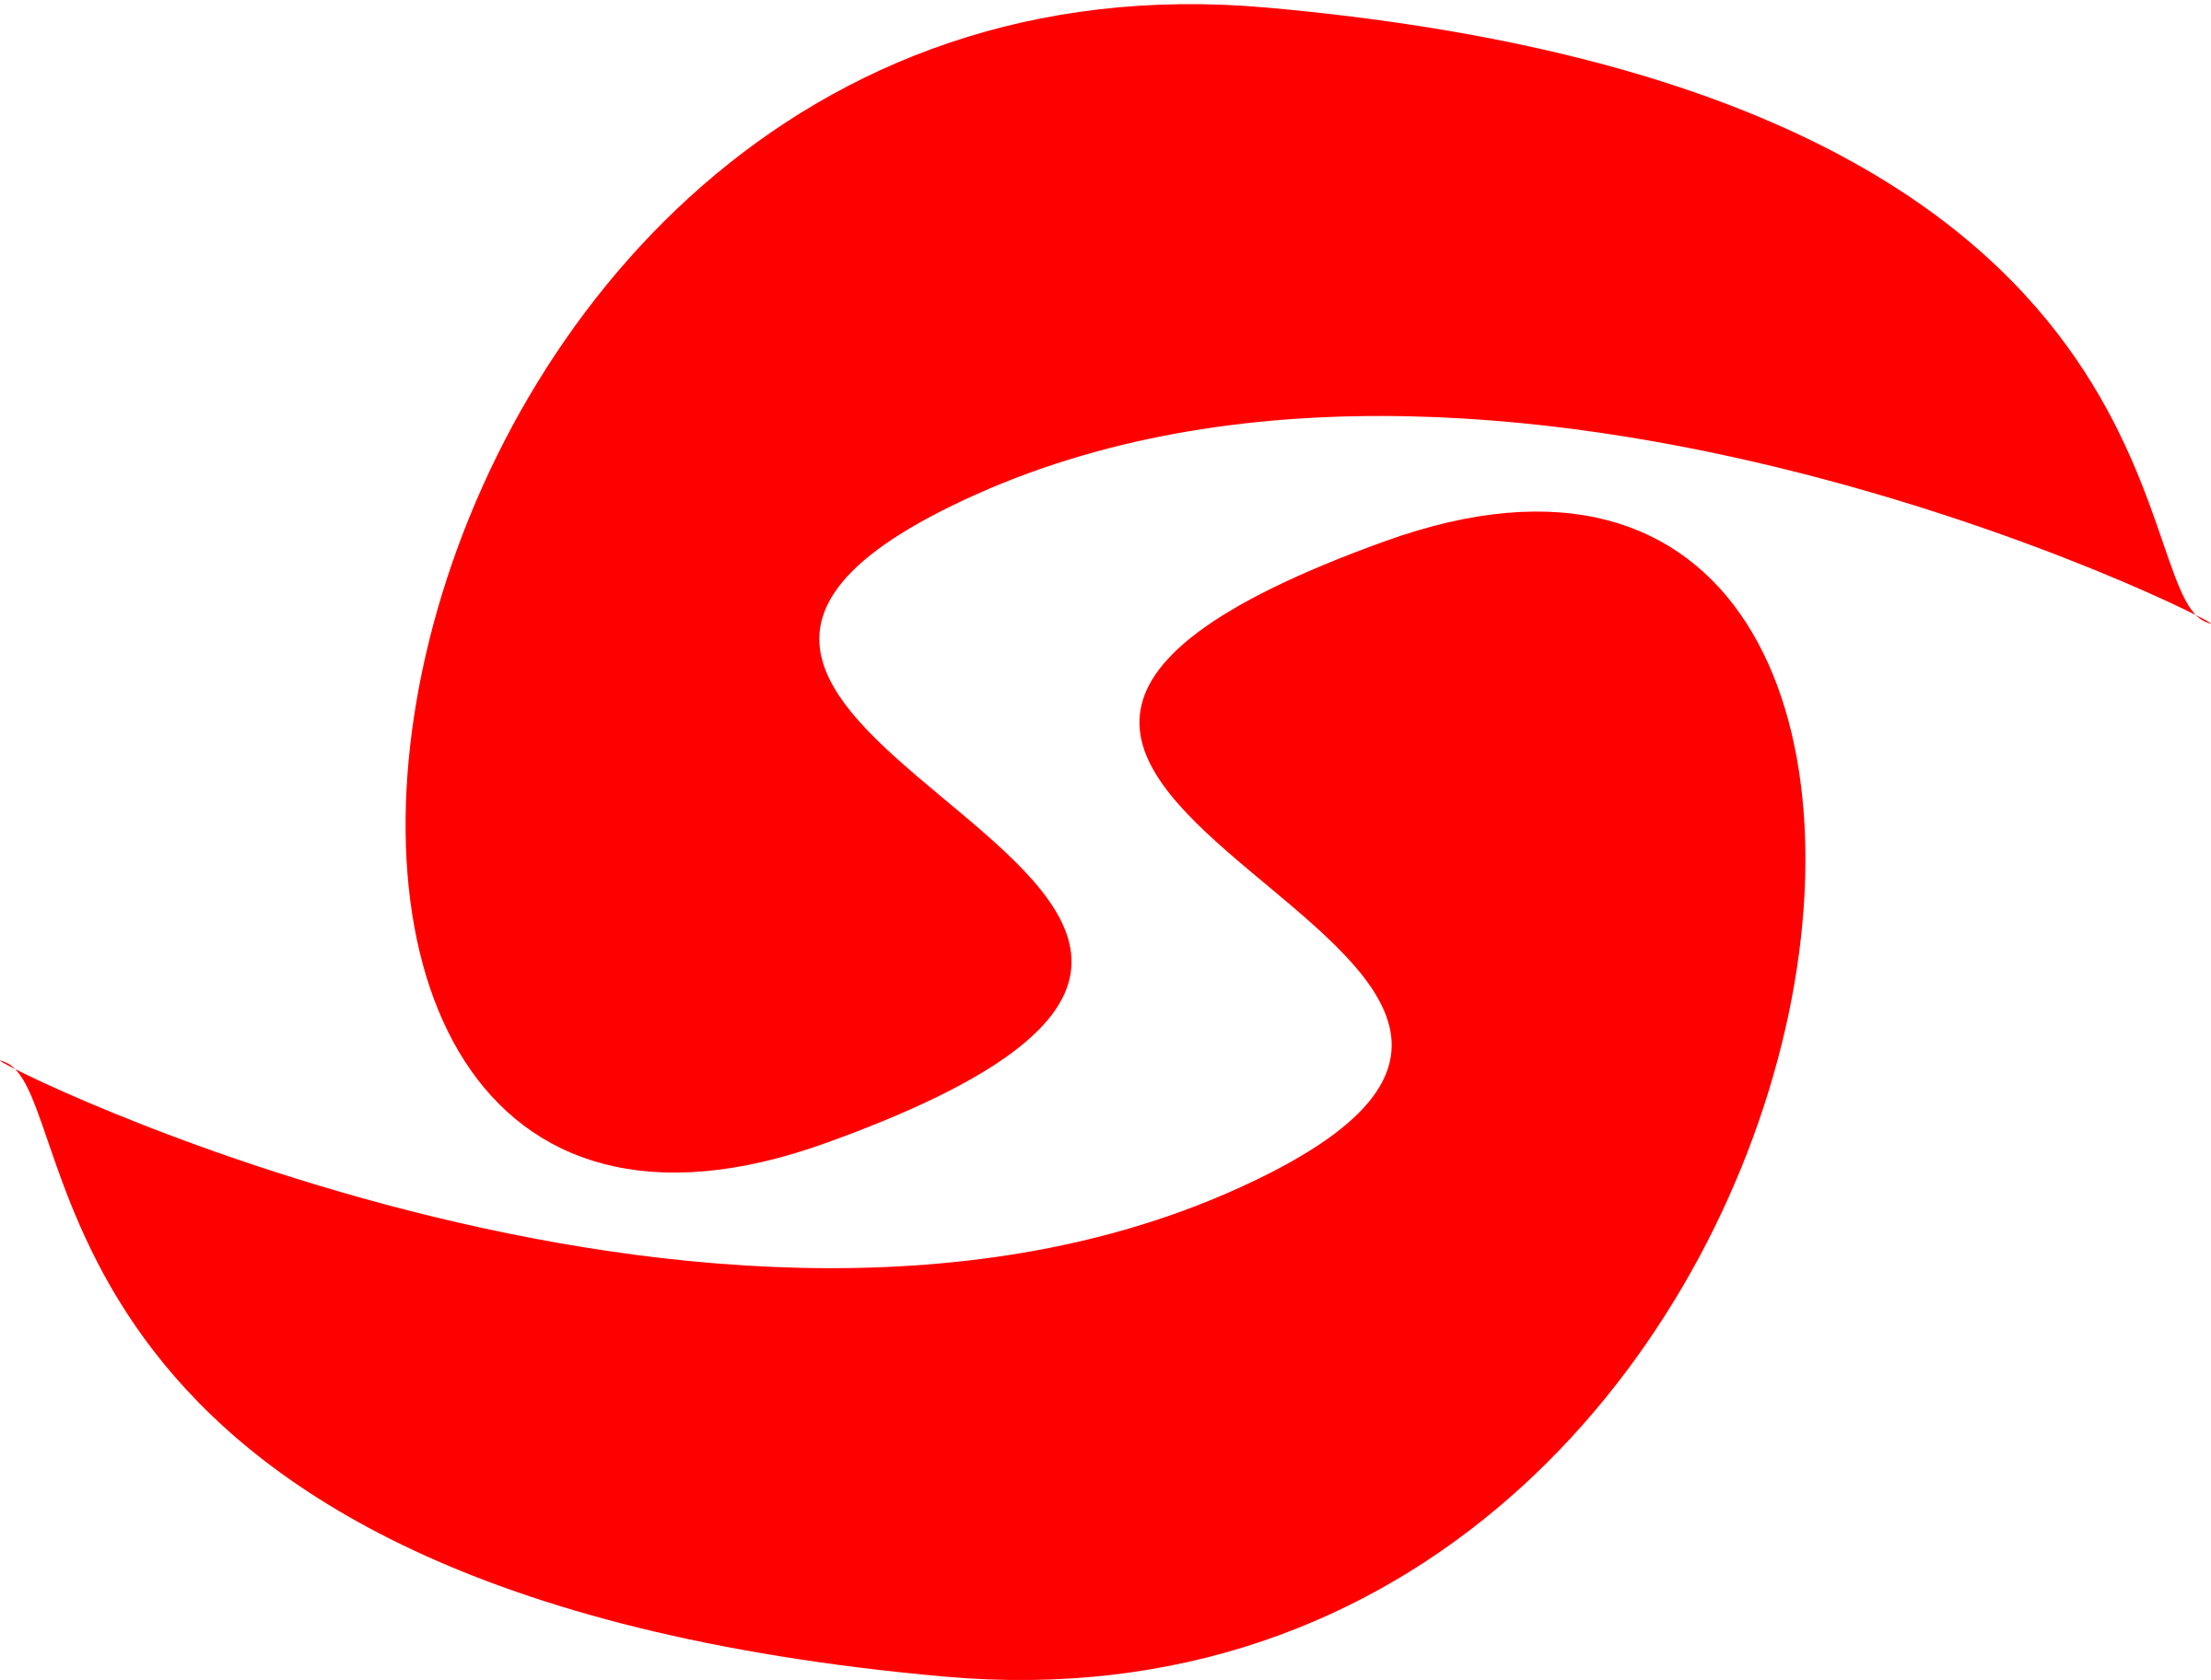 Clipart s logo s logo thecheapjerseys Gallery